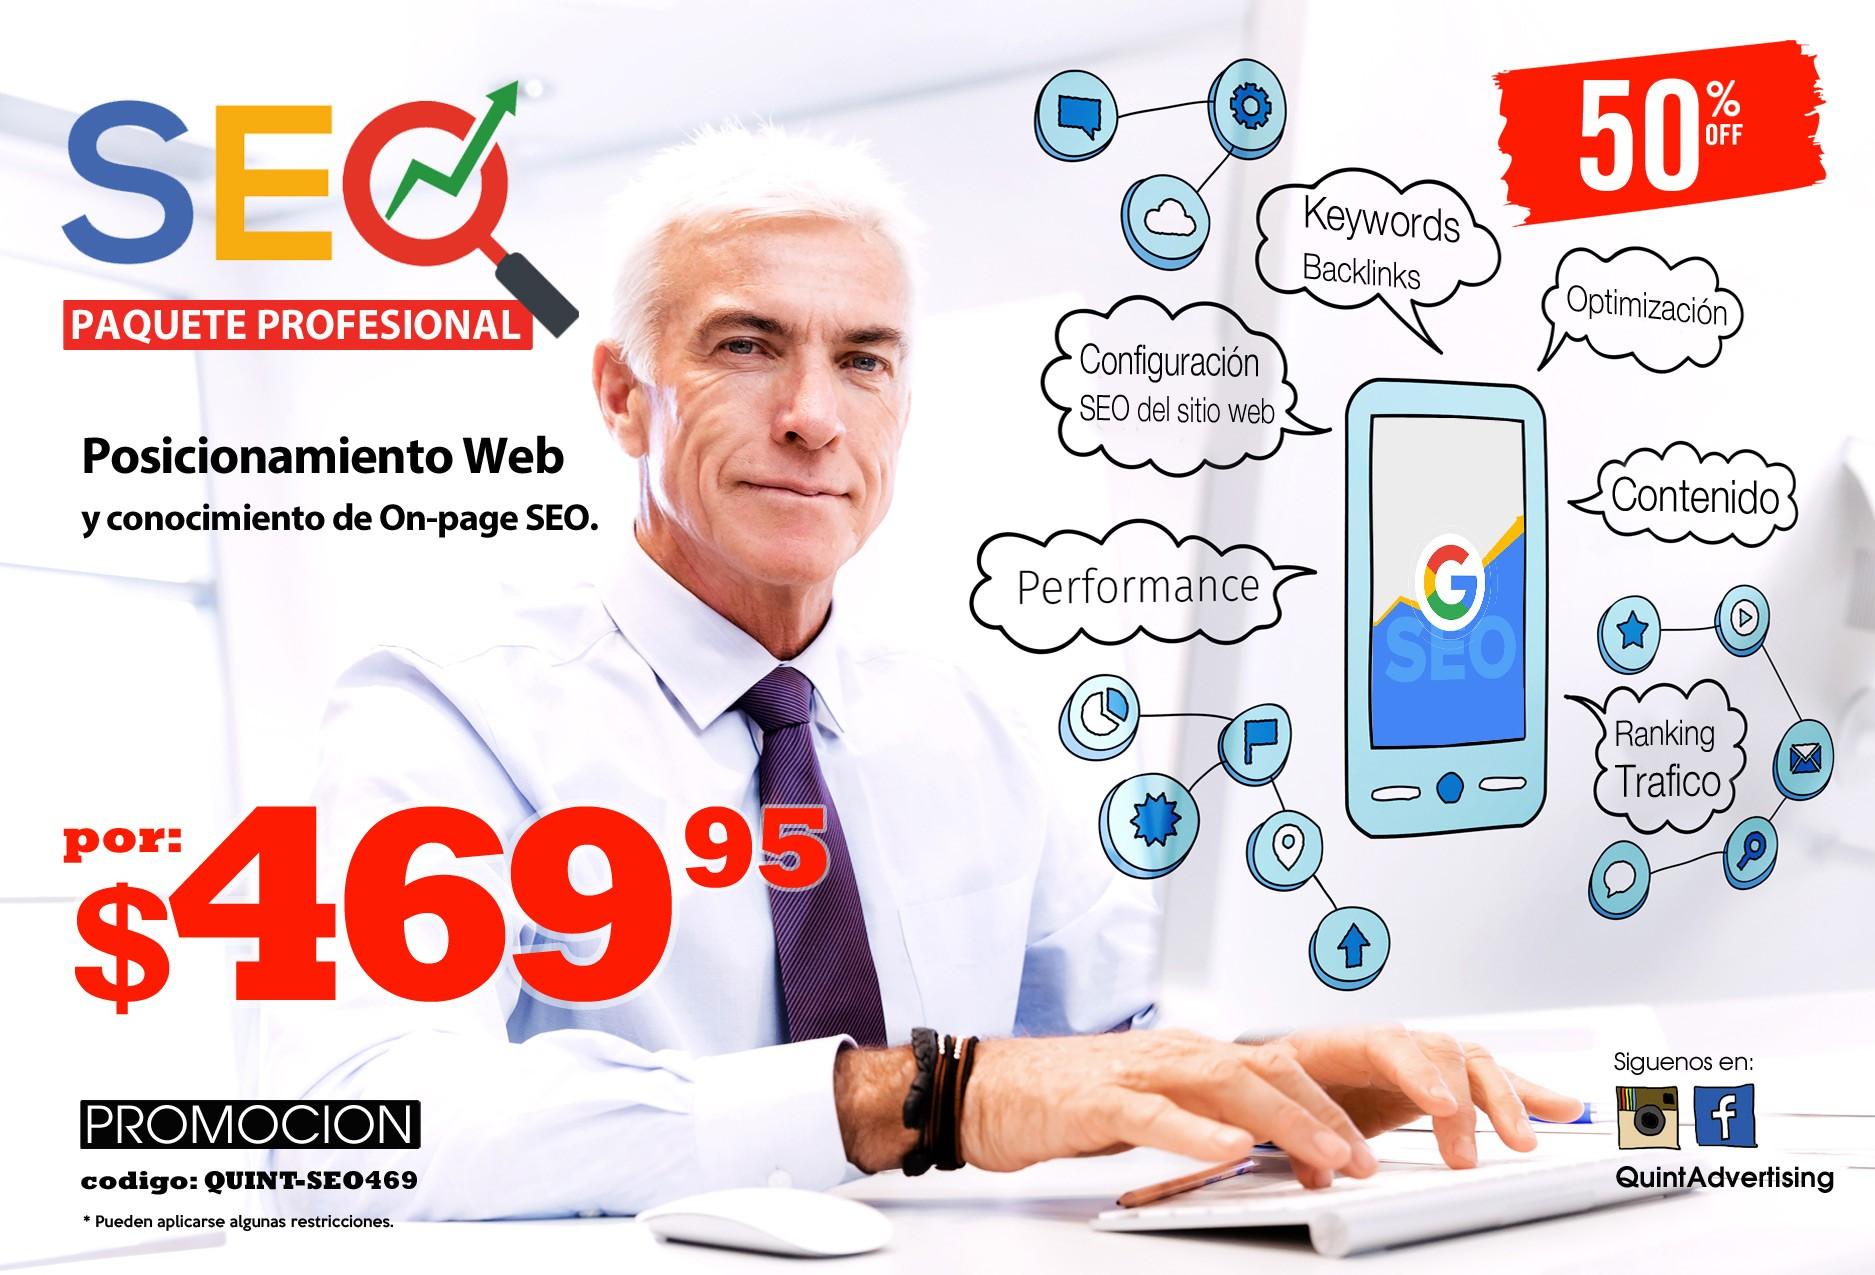 0-promoción-promo-promotion-offer-oferta-SEO-google-business-analytics-search-console-organic-quint-advertising-maimi-florida-austin-texas-eeuu-español